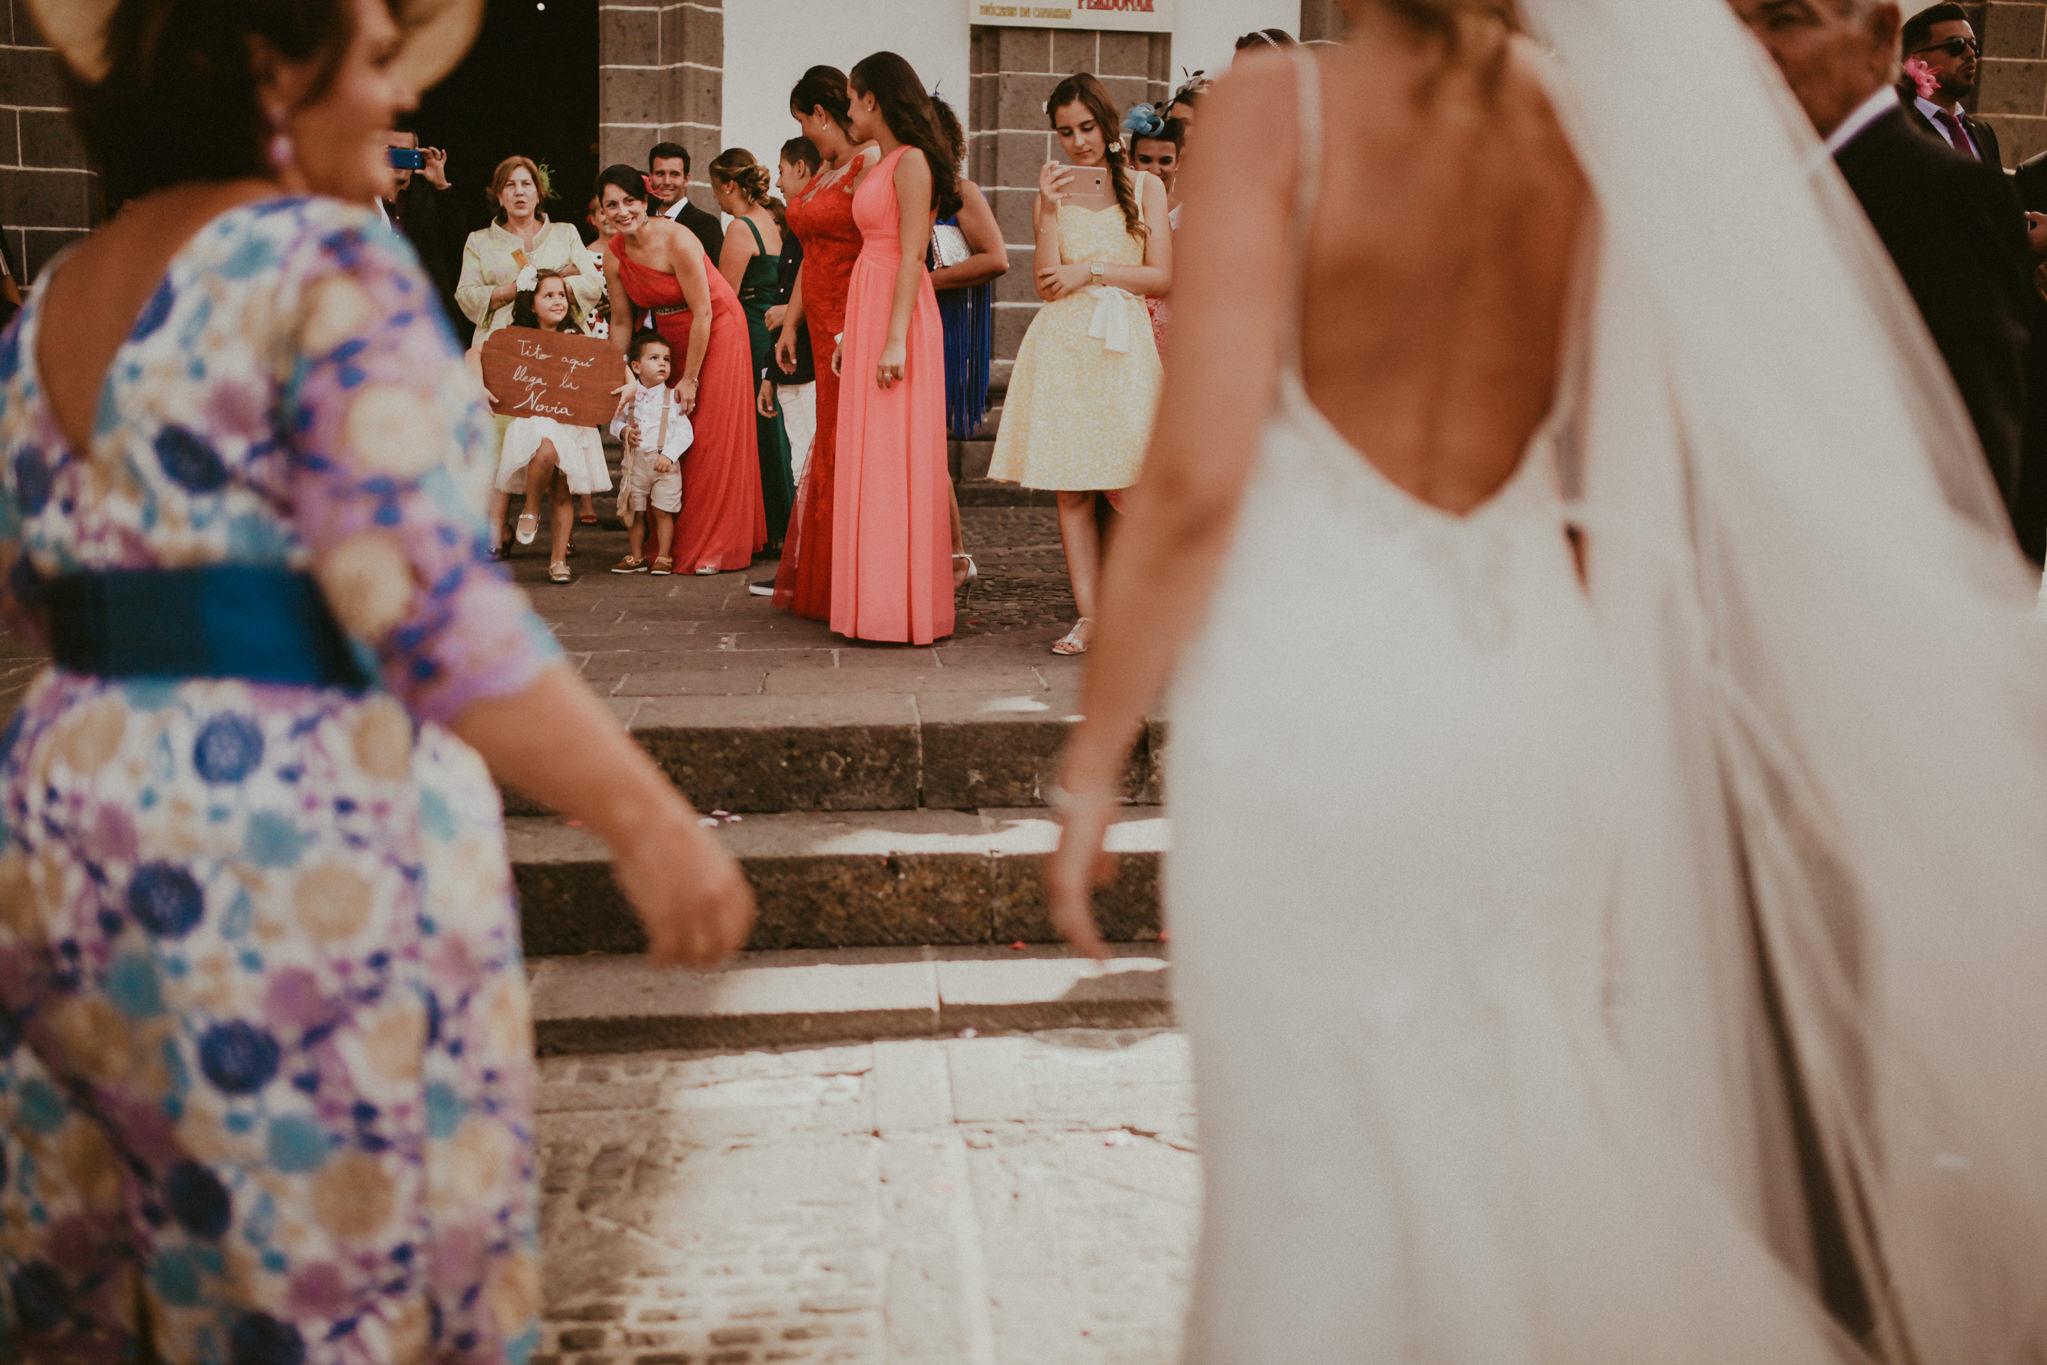 boda-diferente-fotografo-boda-laspalmas-grancanaria-30